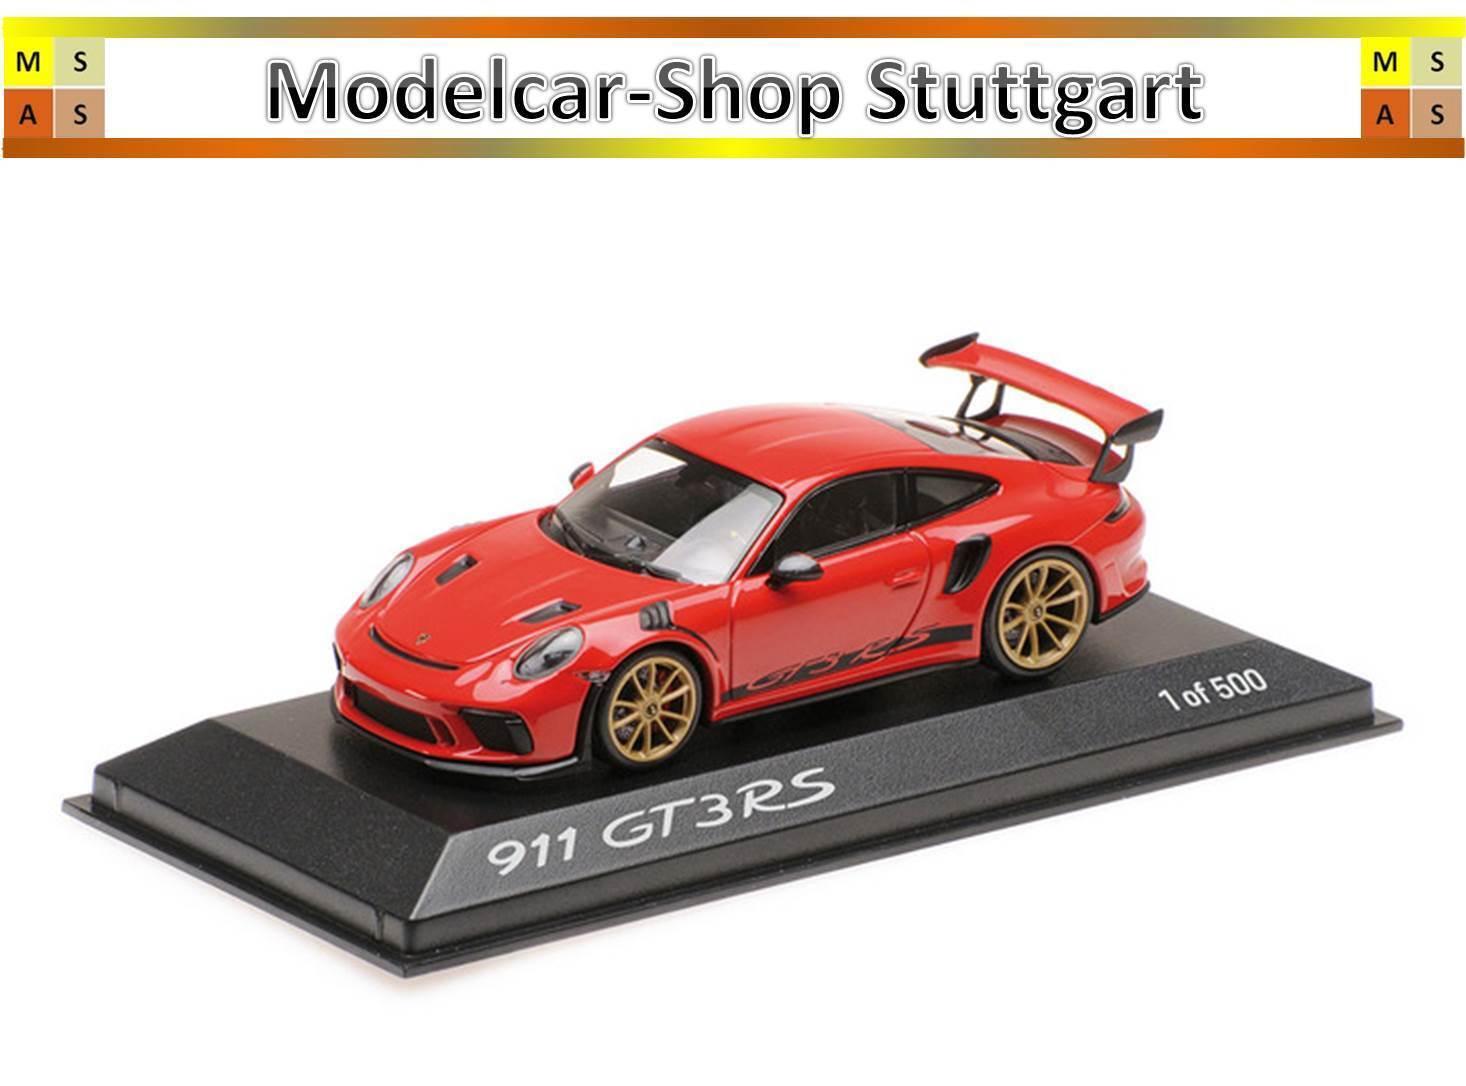 Porsche 911 gt3 RS rojo teja Minichamps Minichamps Minichamps 1 43 Limited Edition 500 wax02020084 d2b205